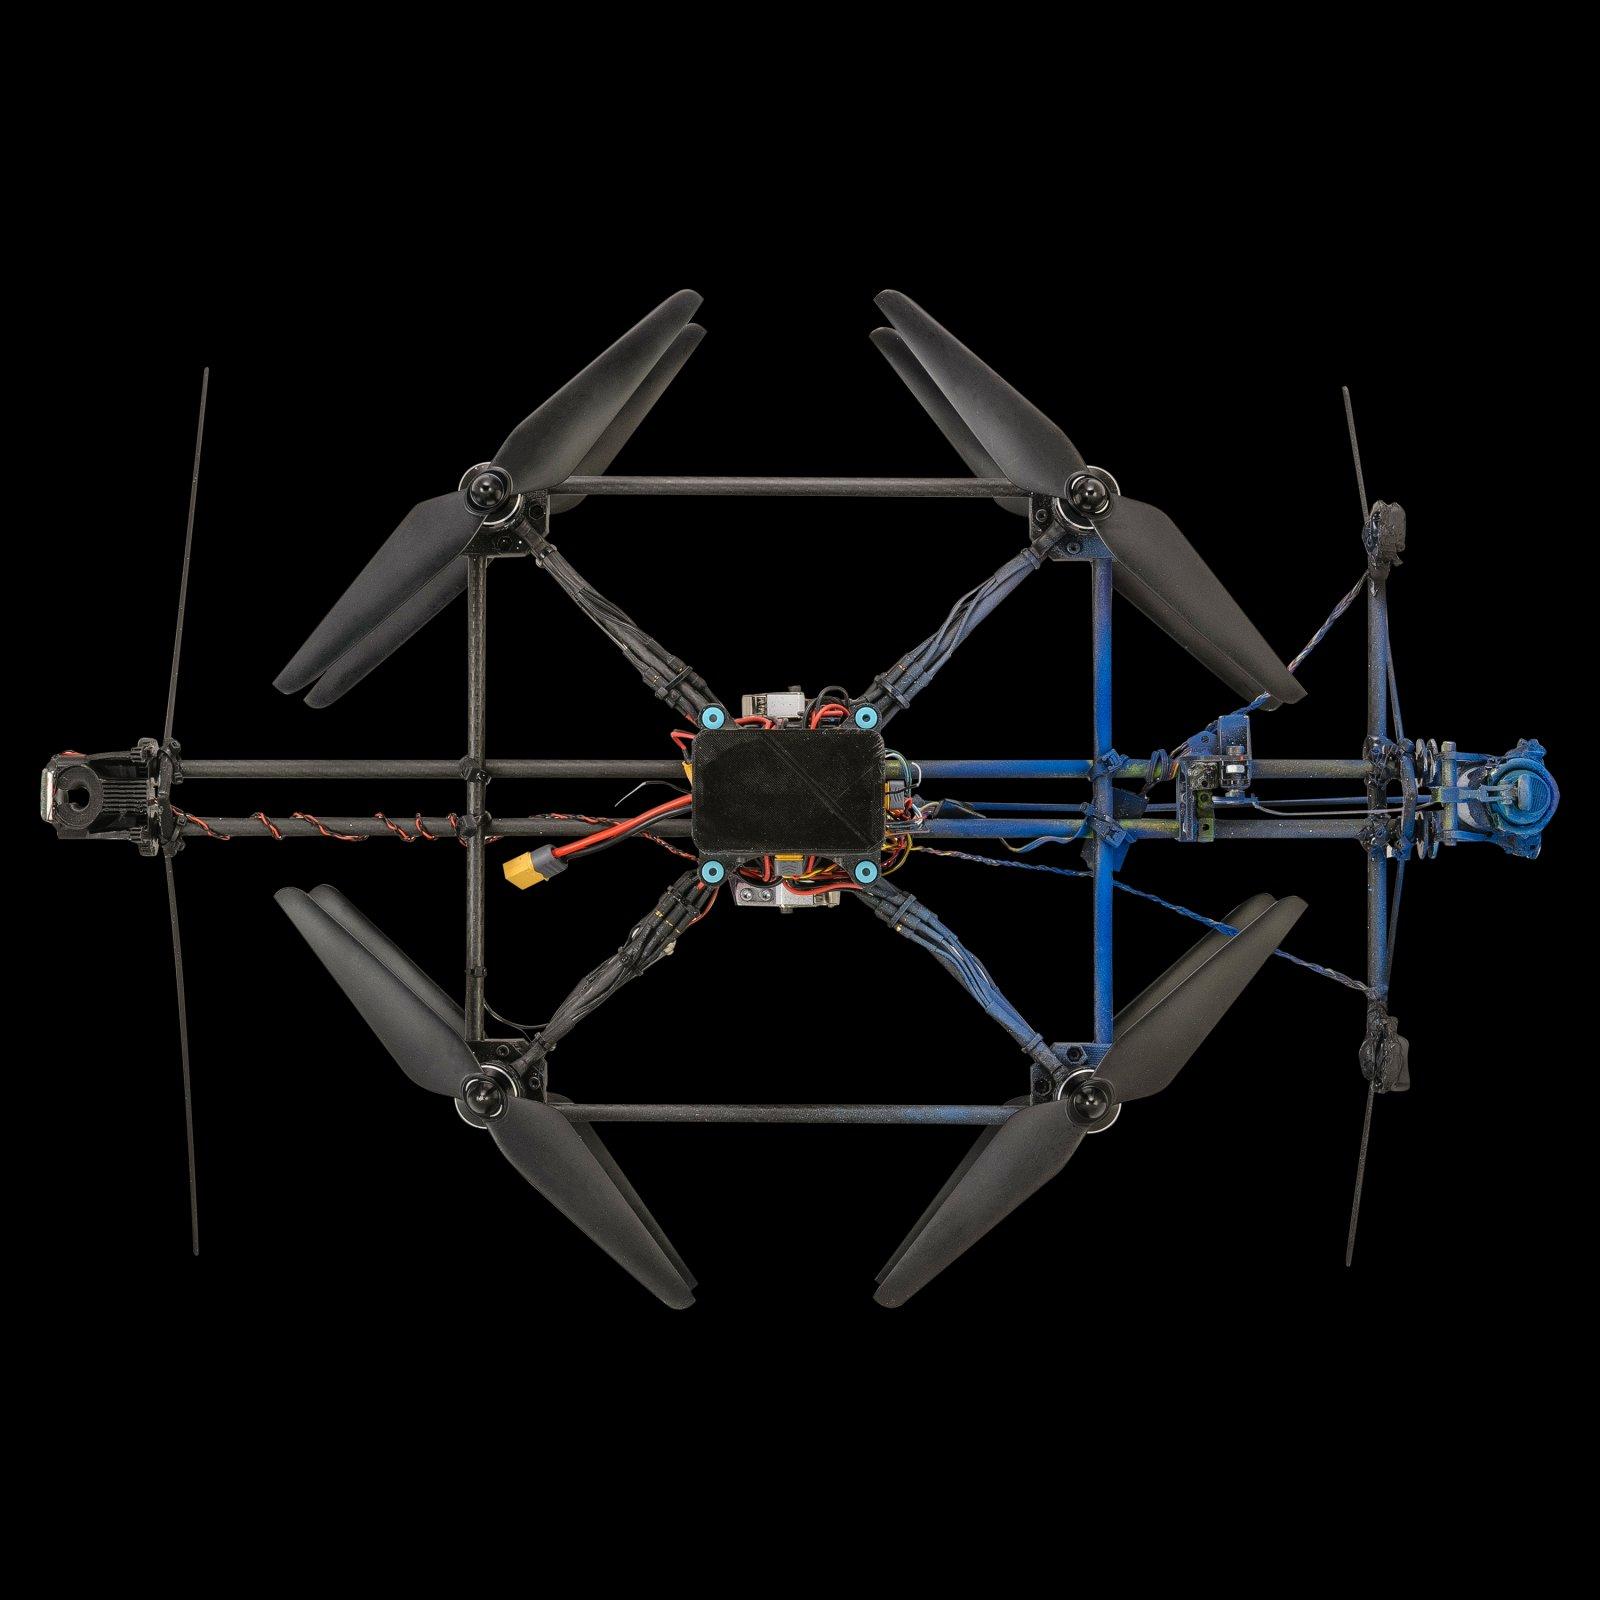 Altium Limited объявляет о начале сотрудничества с Tsuru Robotics